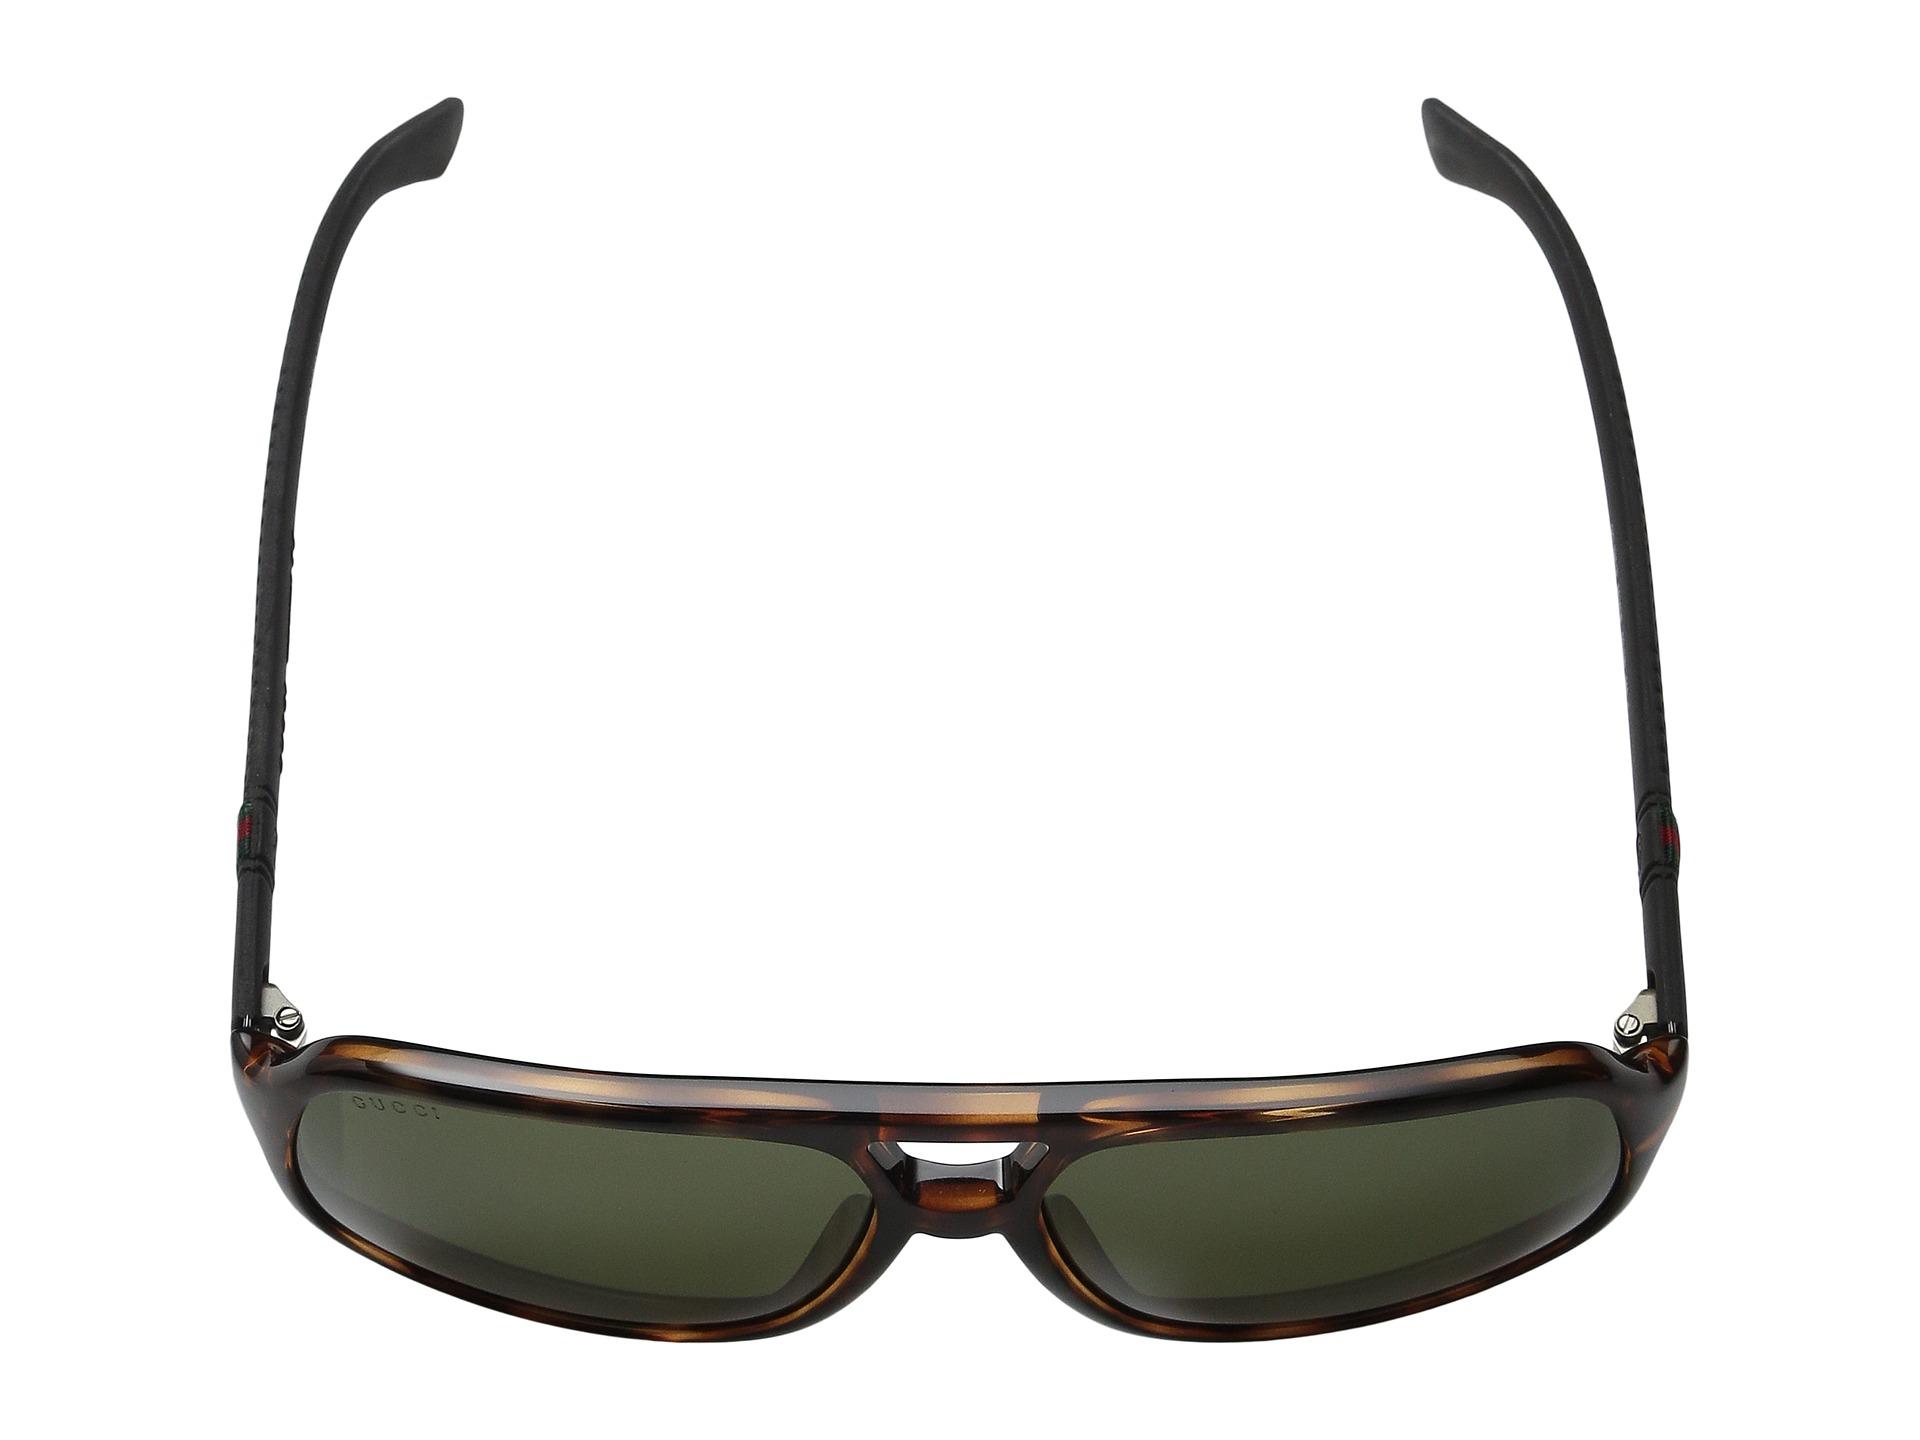 ef05cb2b2427b Lyst - Gucci Gg 1115s in Black for Men